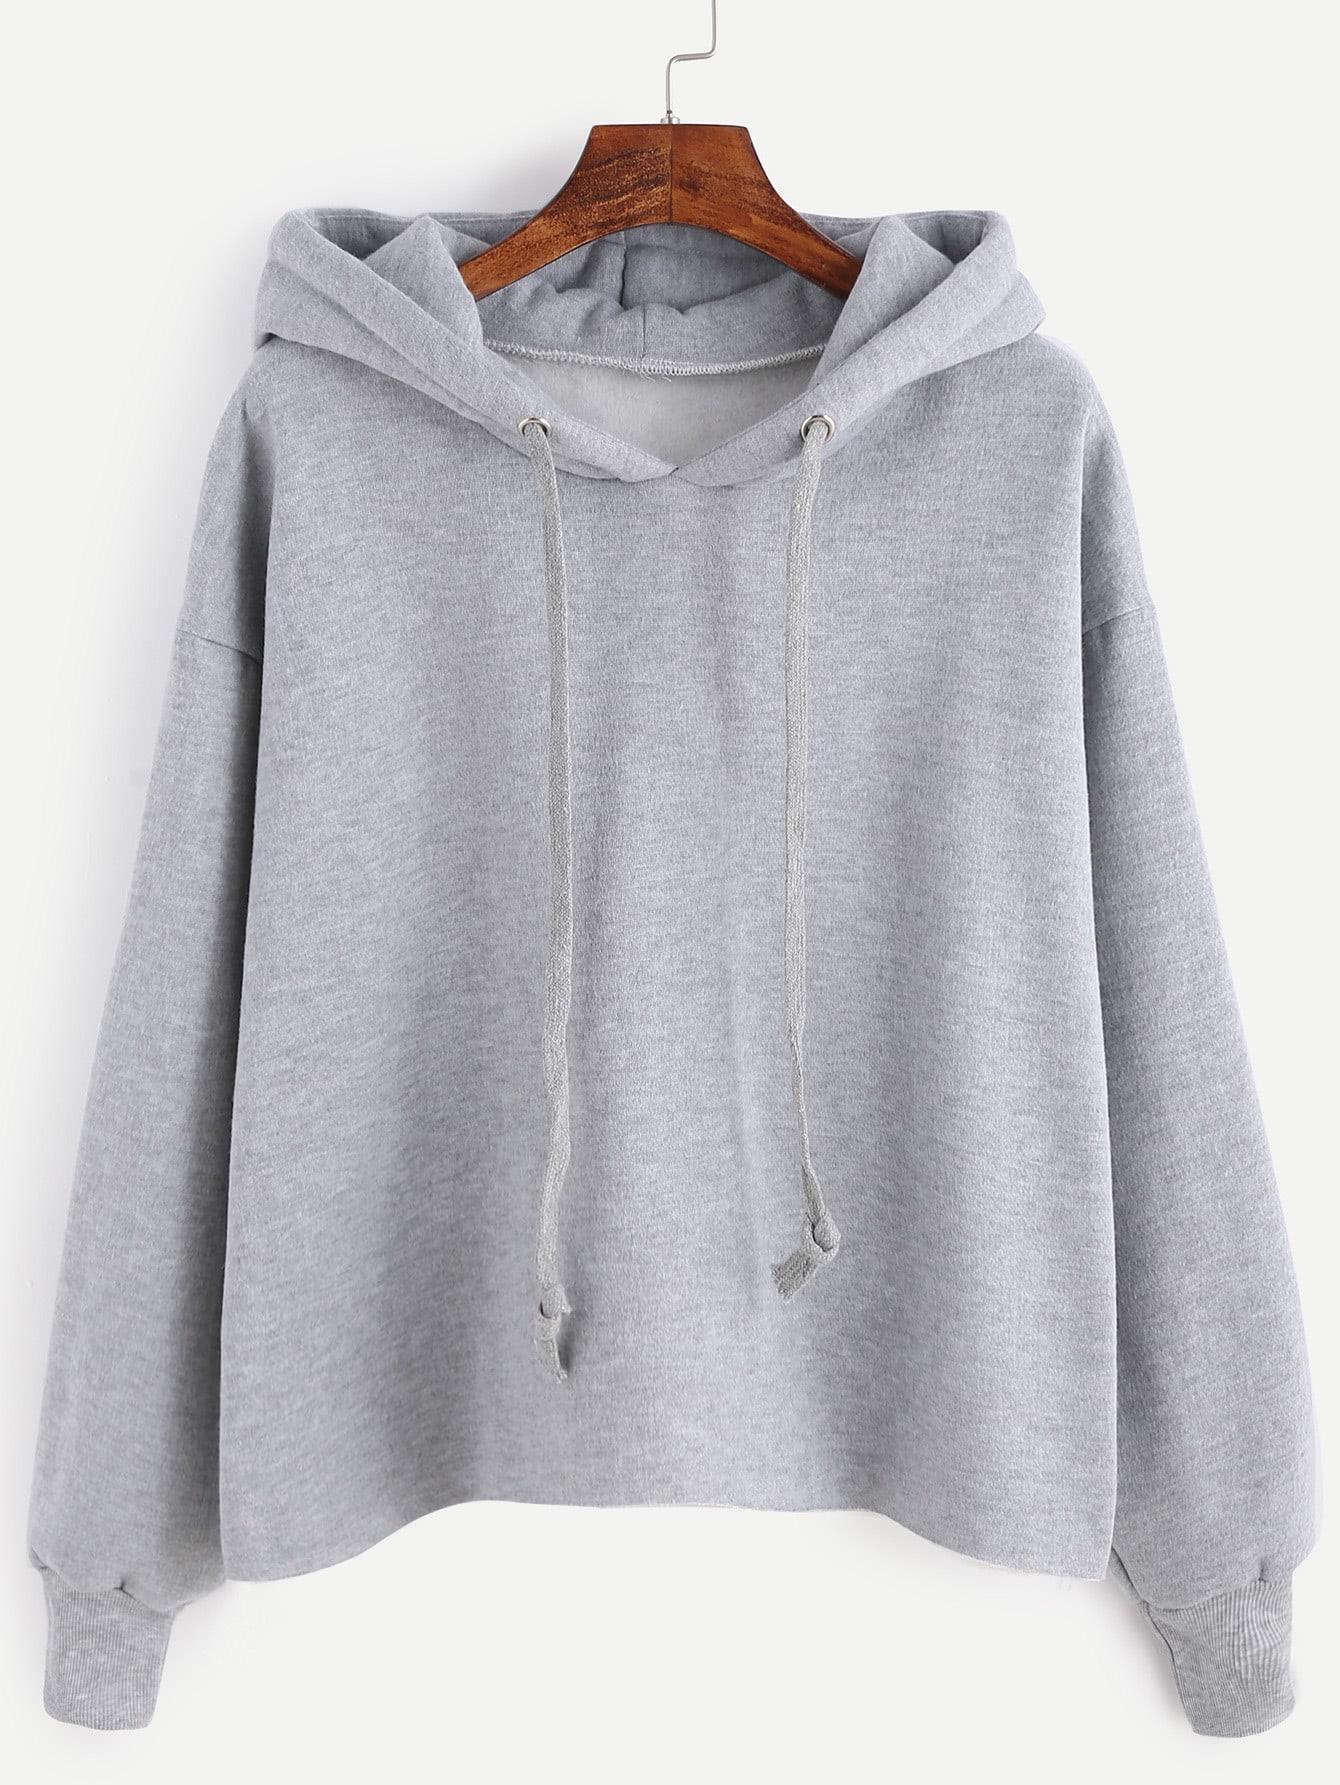 Drawstring Hooded Sweatshirt sweatshirt161021105